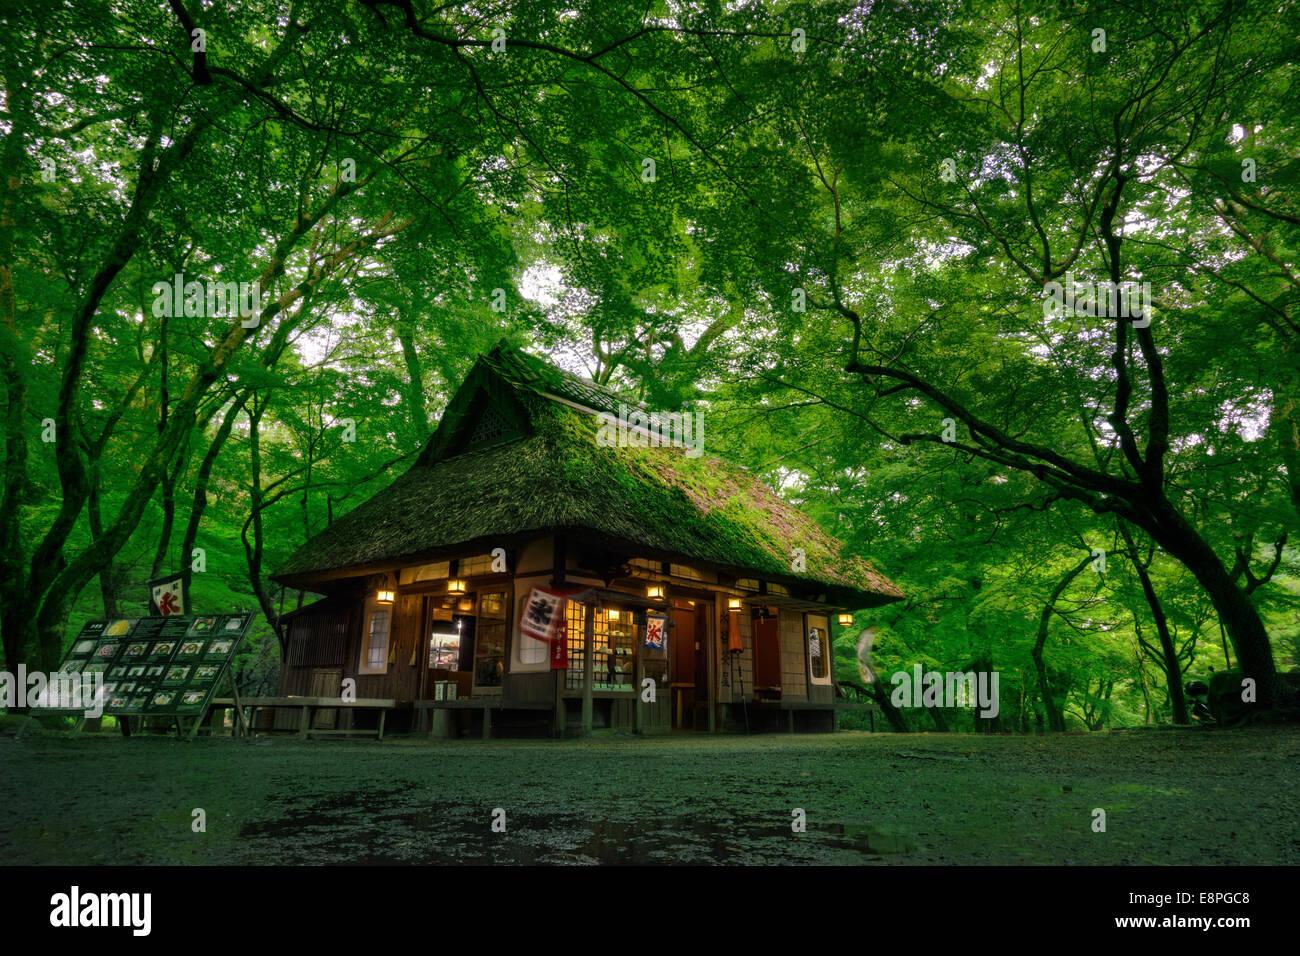 Mizuya Chaya Tea House in Nara, Japan - Stock Image